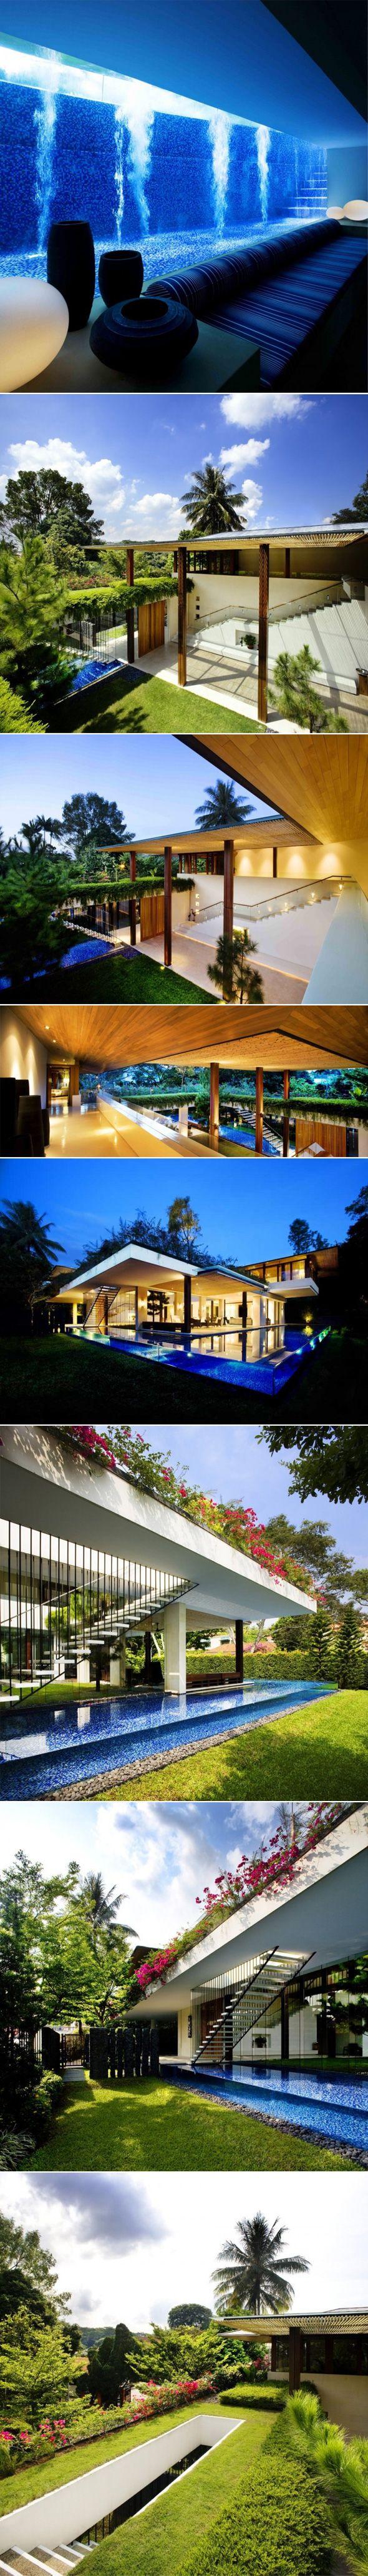 Tangga House By Guz Architects. Singapore Architecture Moderne, Modern  Architecture, Residential Architecture,